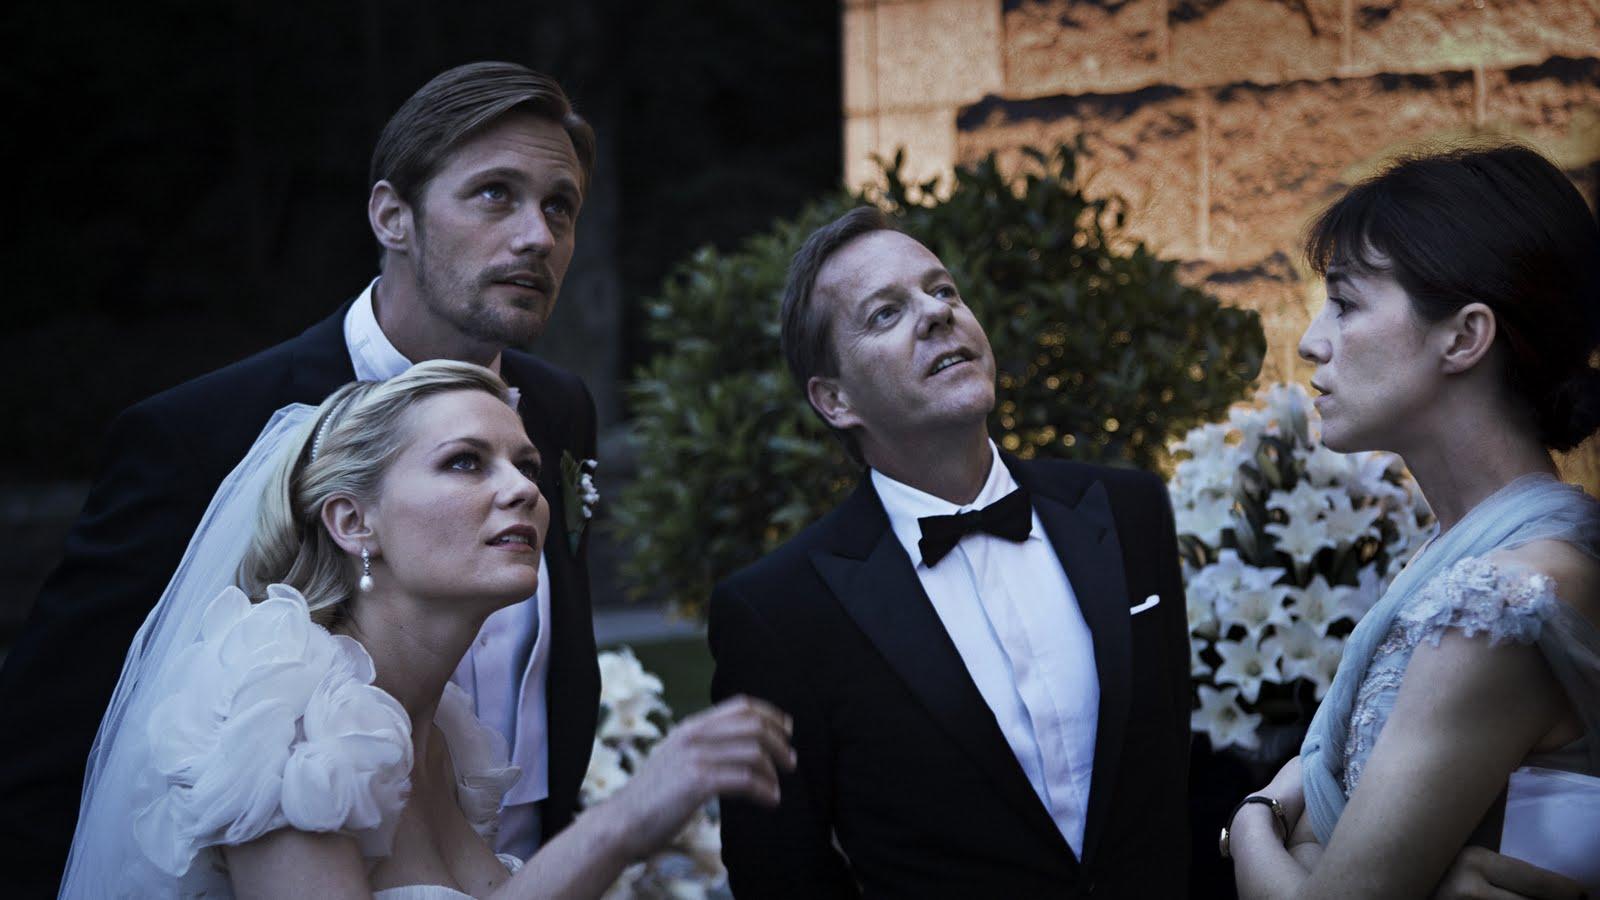 Alexander Skarsgard, Kirsten Dunst, Kiefer Sutherland, Charlotte Gainsbourg in Melancholia (2011)